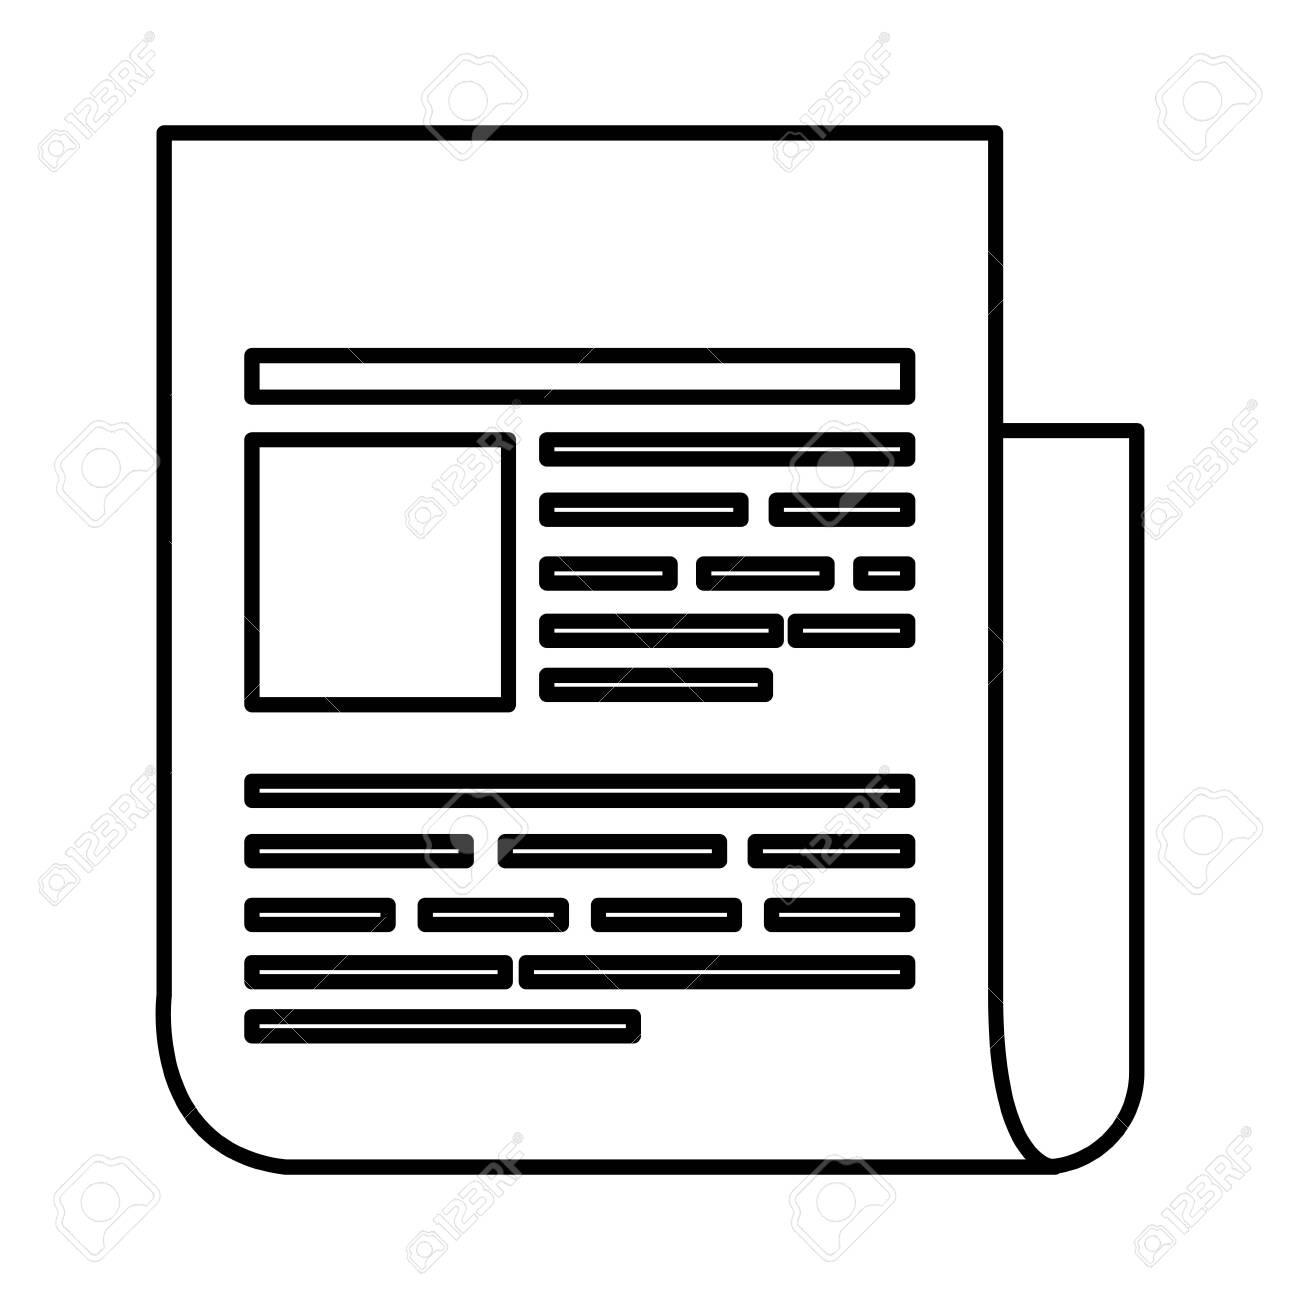 paper document file icon vector illustration design - 124940509